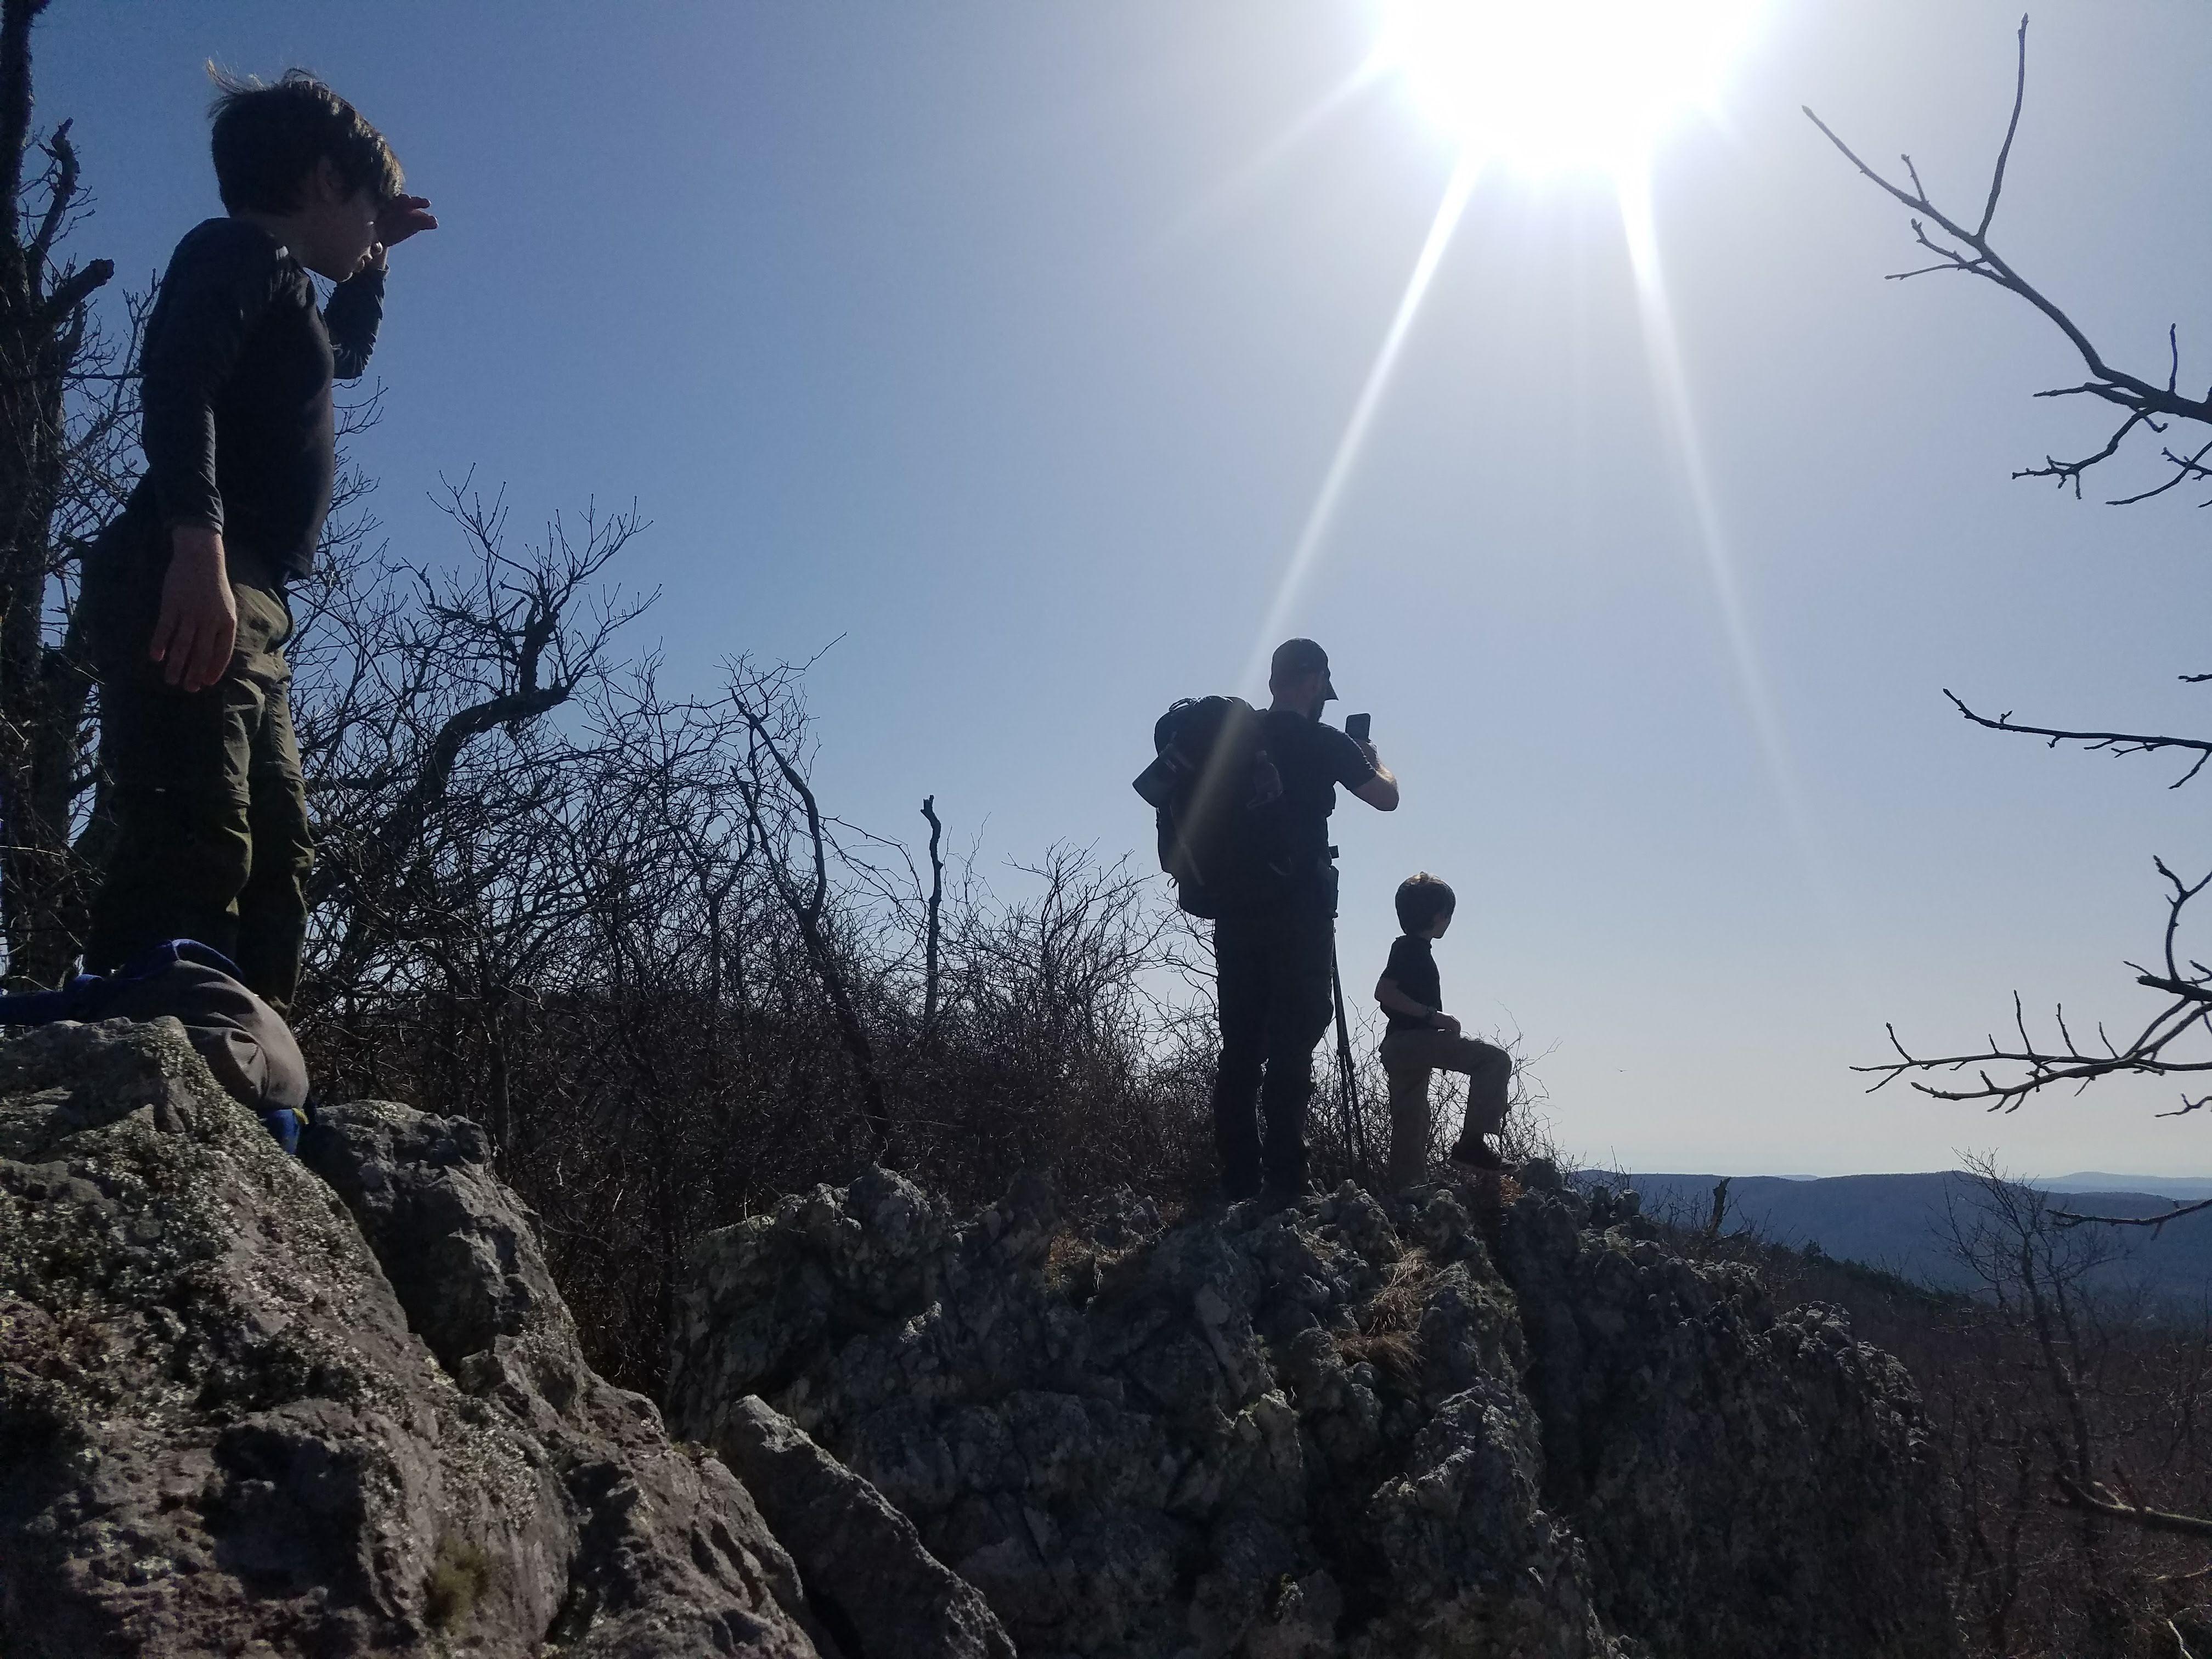 hiking view mountain outdoors family adventure